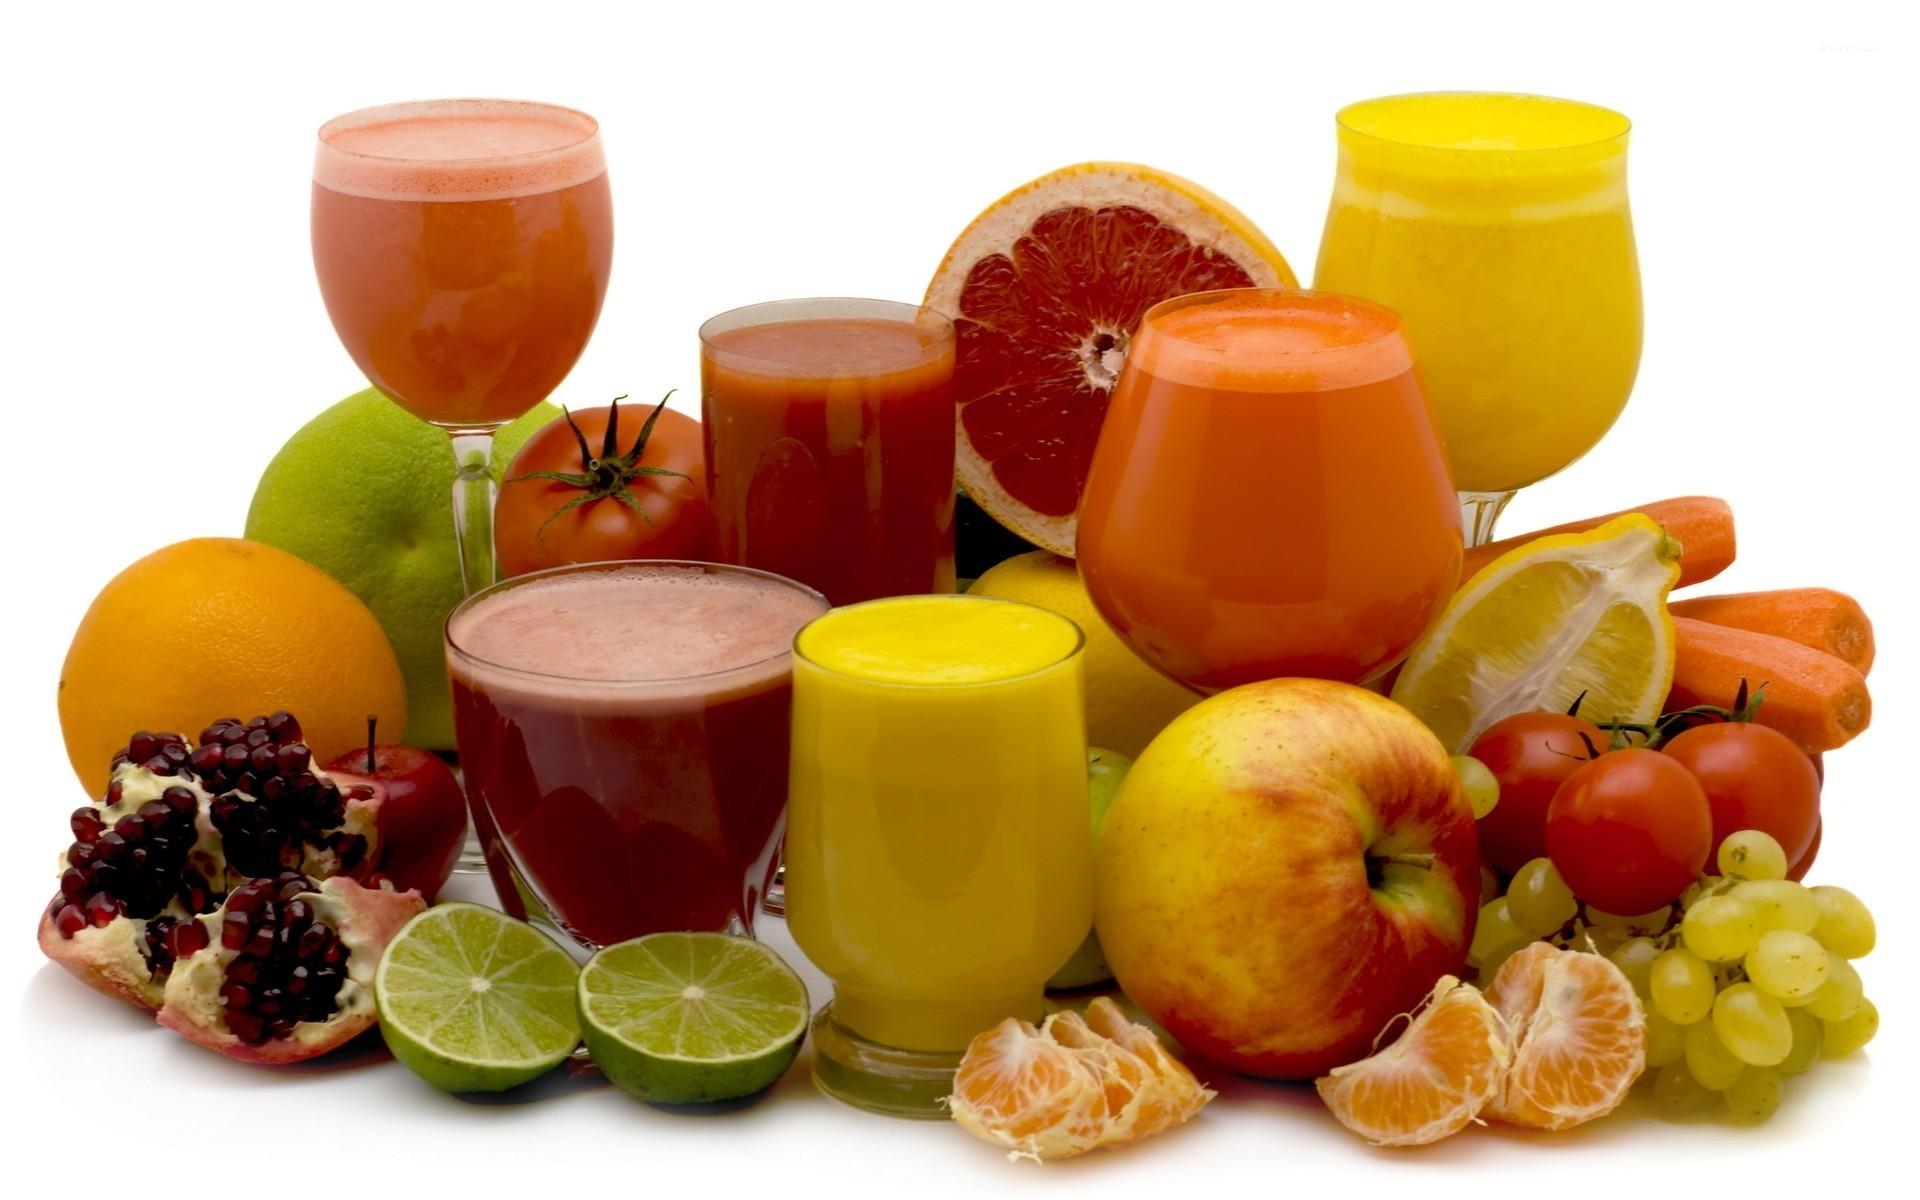 Fruit juice wallpaper   Photography wallpapers   10418 1366x768